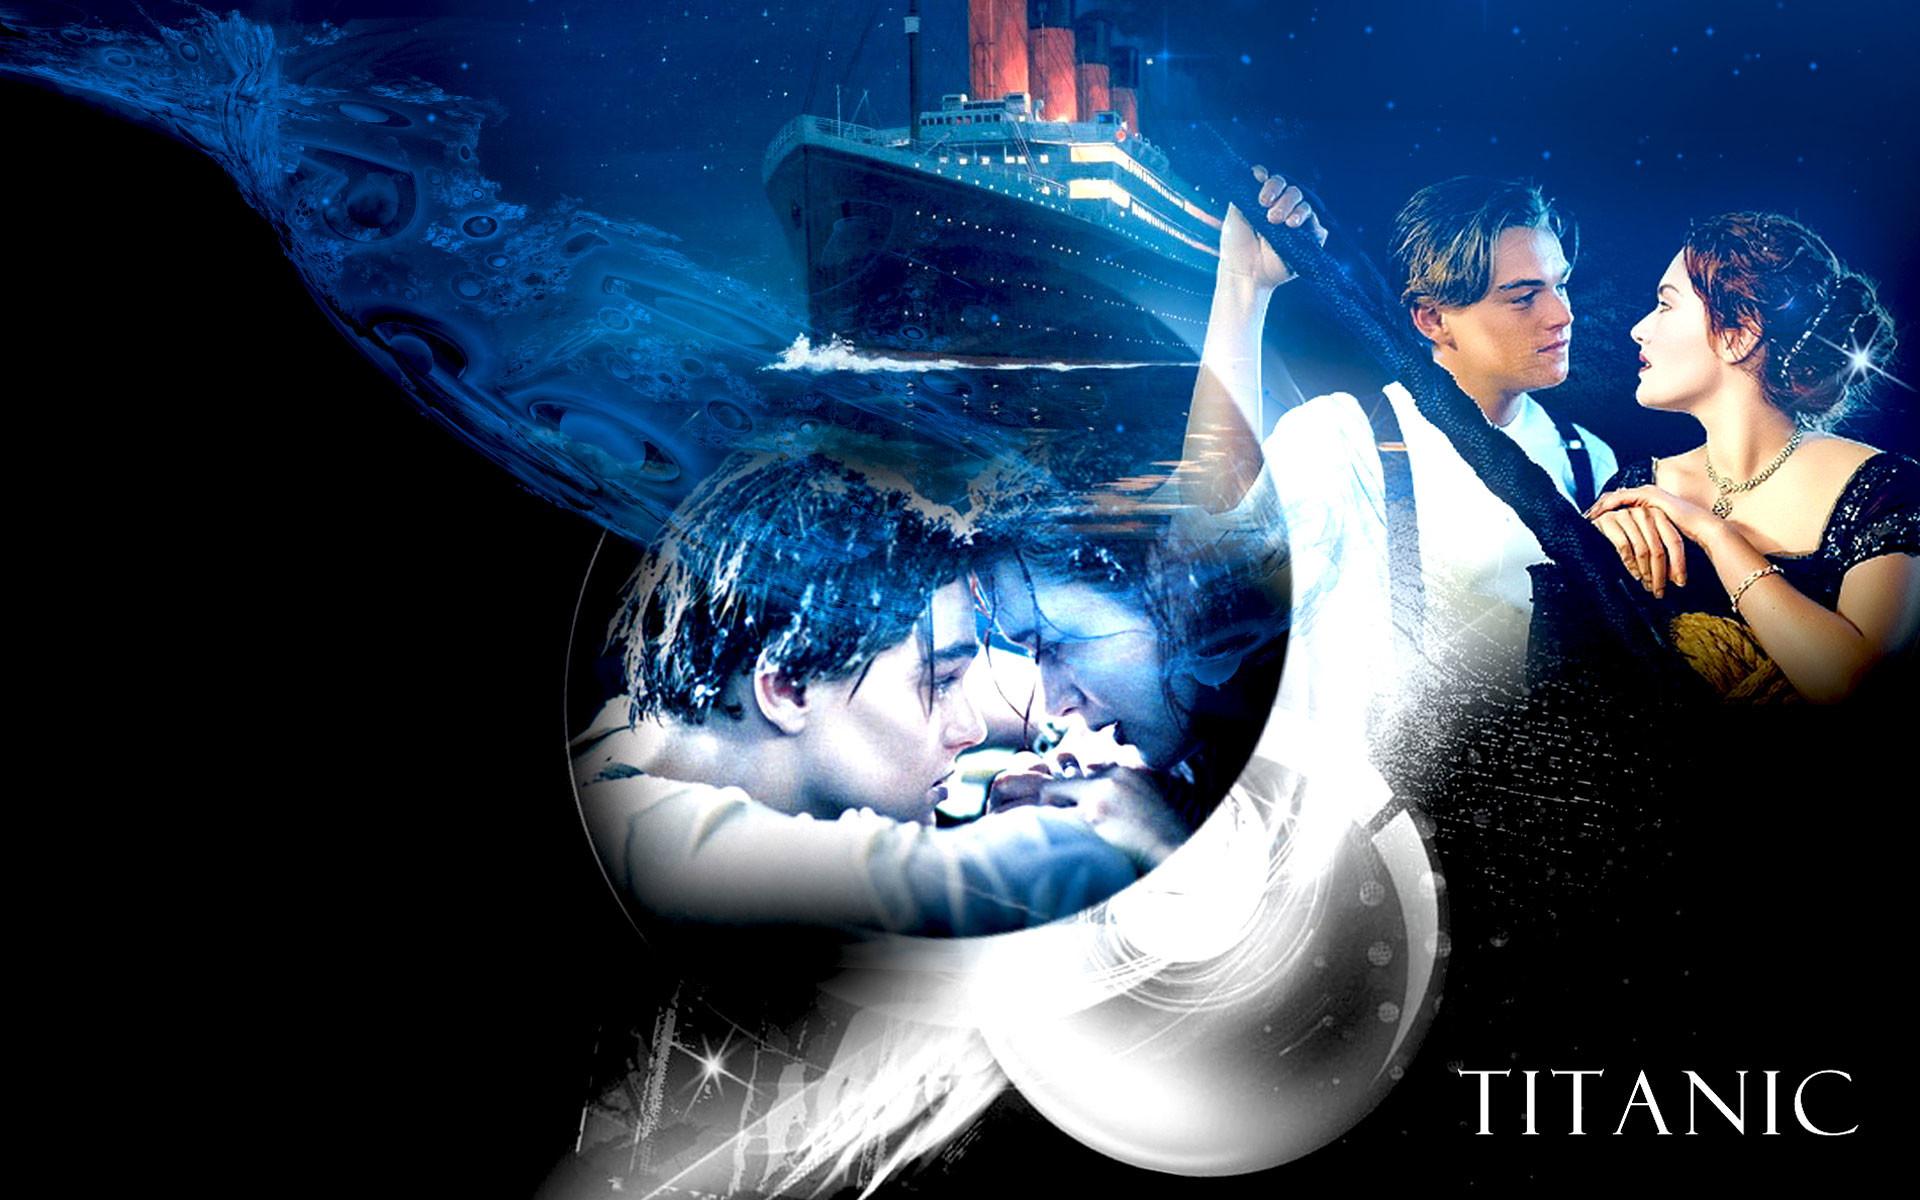 Titanic Movie Wallpaper ·① WallpaperTag